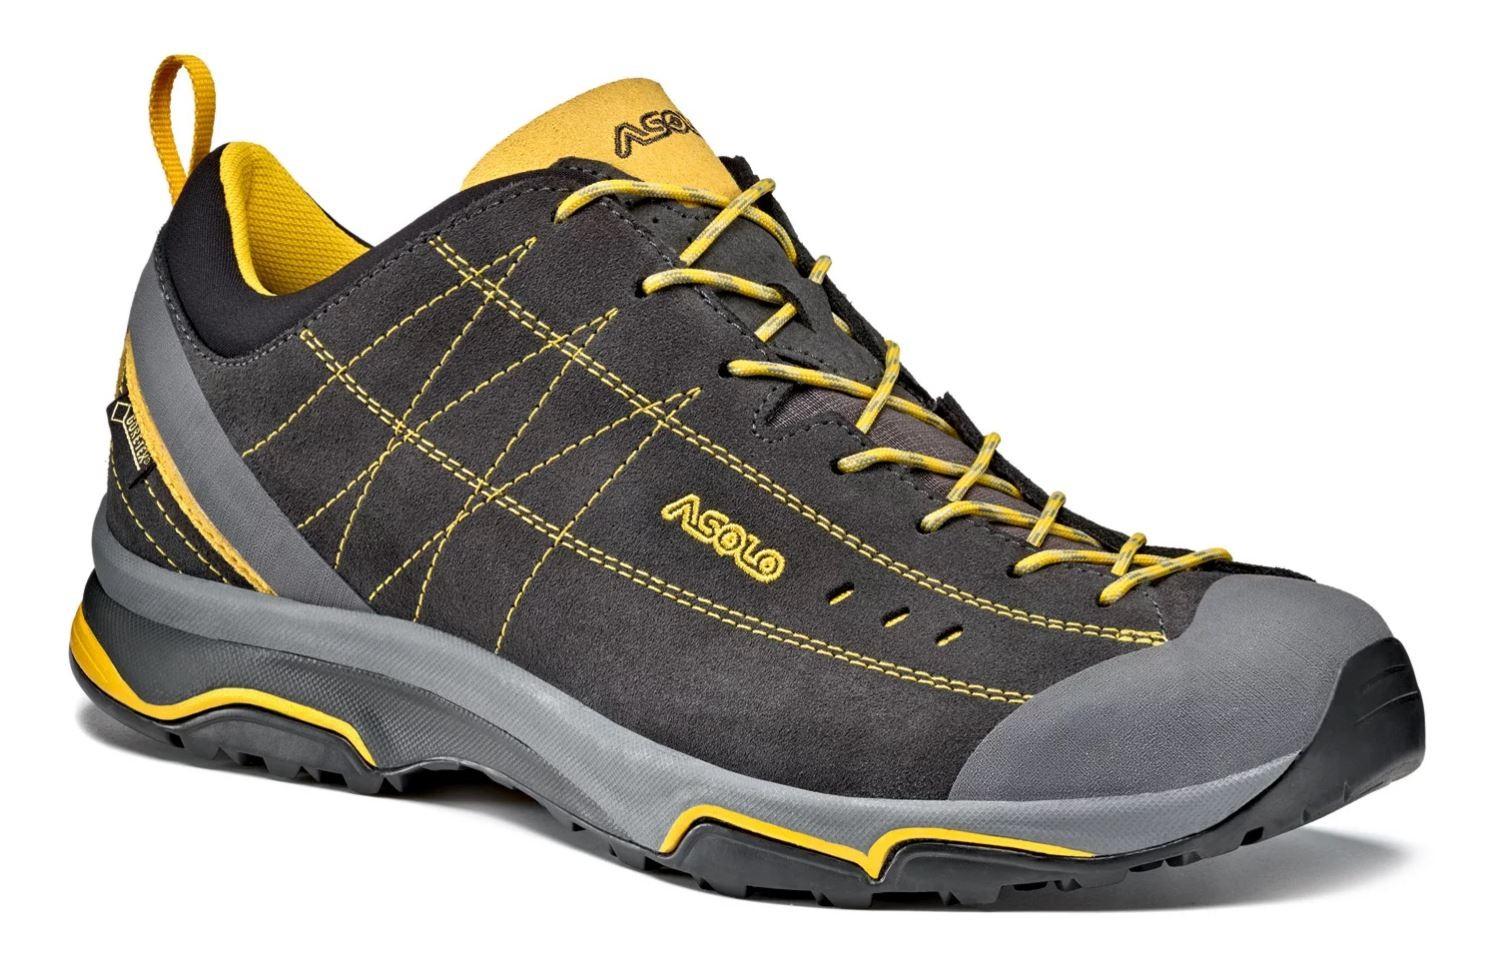 Chaussures Montagne De Rayonrando Asolo Asolo Rayonrando De Chaussures Montagne Chaussures De Montagne Asolo CWrBxQdoe